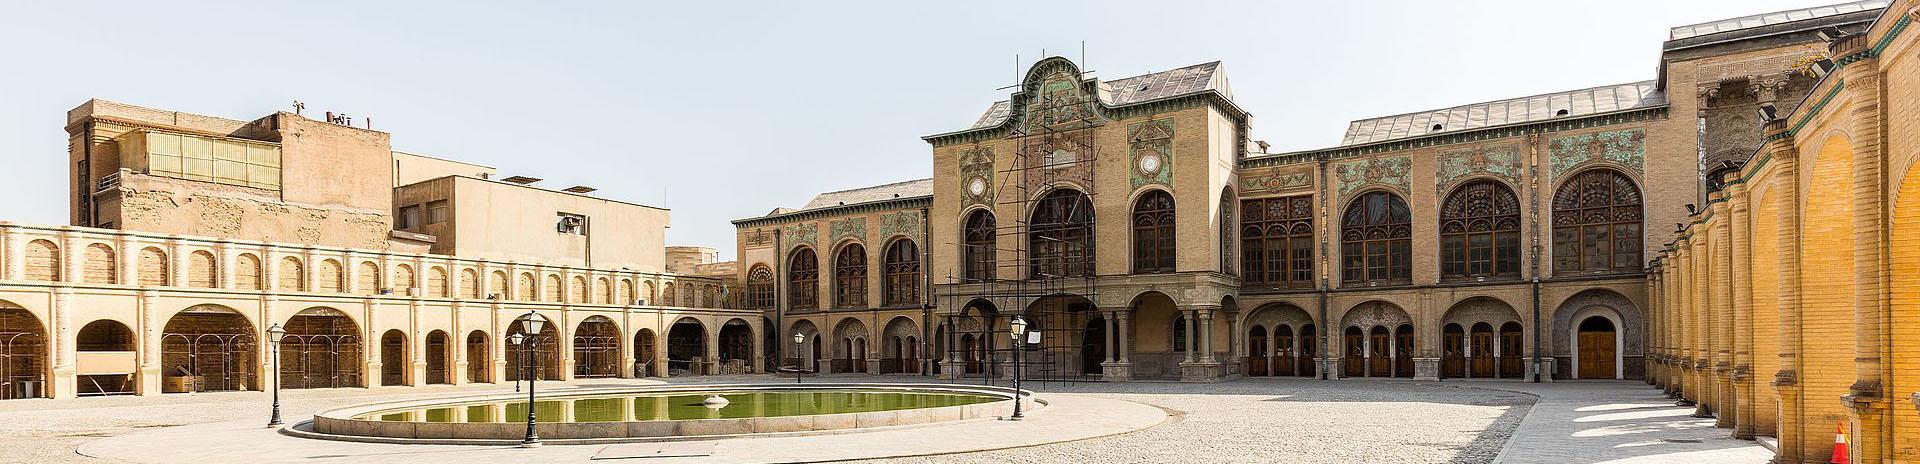 Masoudieh Palace-Tehran